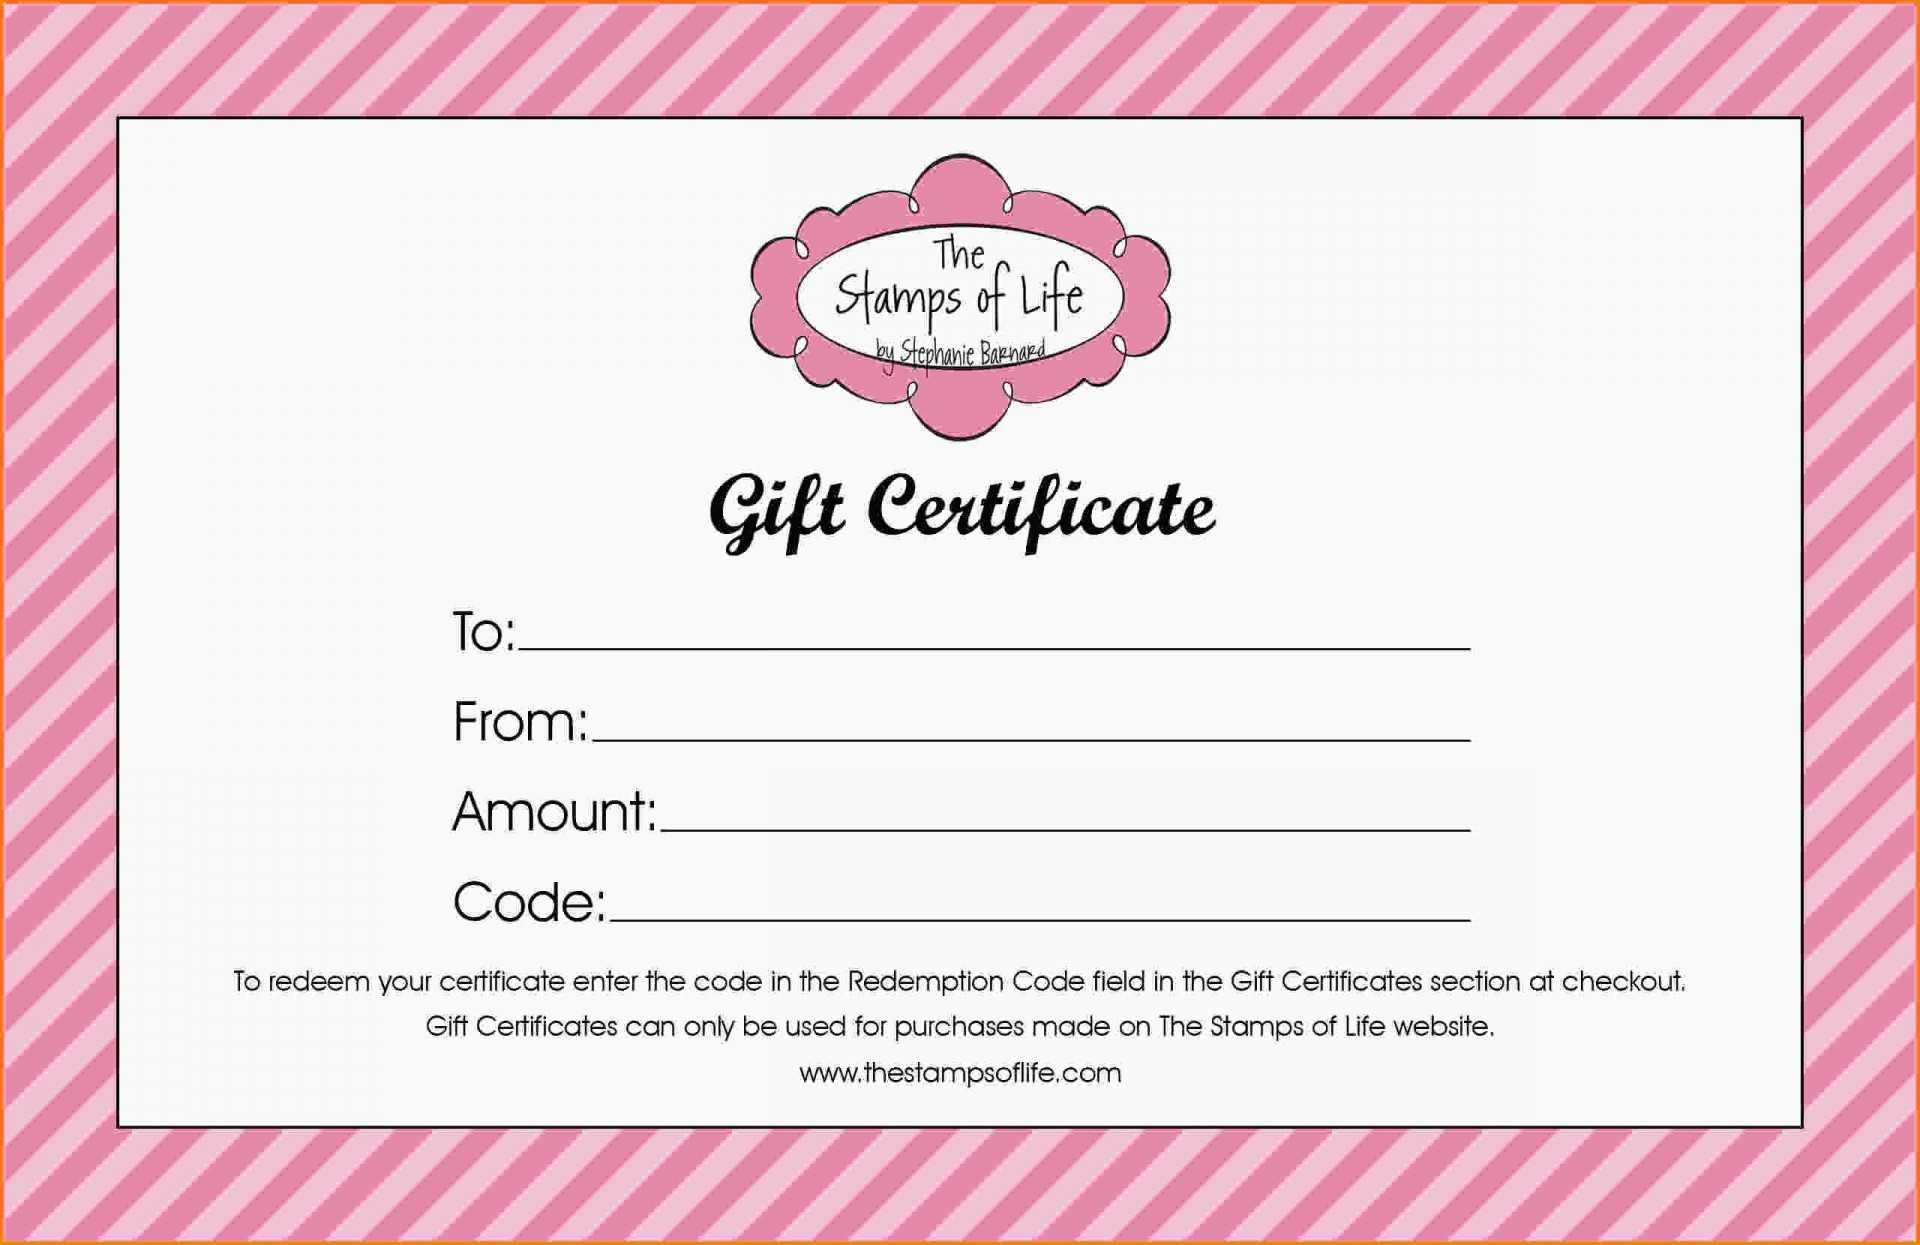 014 4076419 Homemade Gift Certificate Template Printable Inside Homemade Christmas Gift Certificates Templates